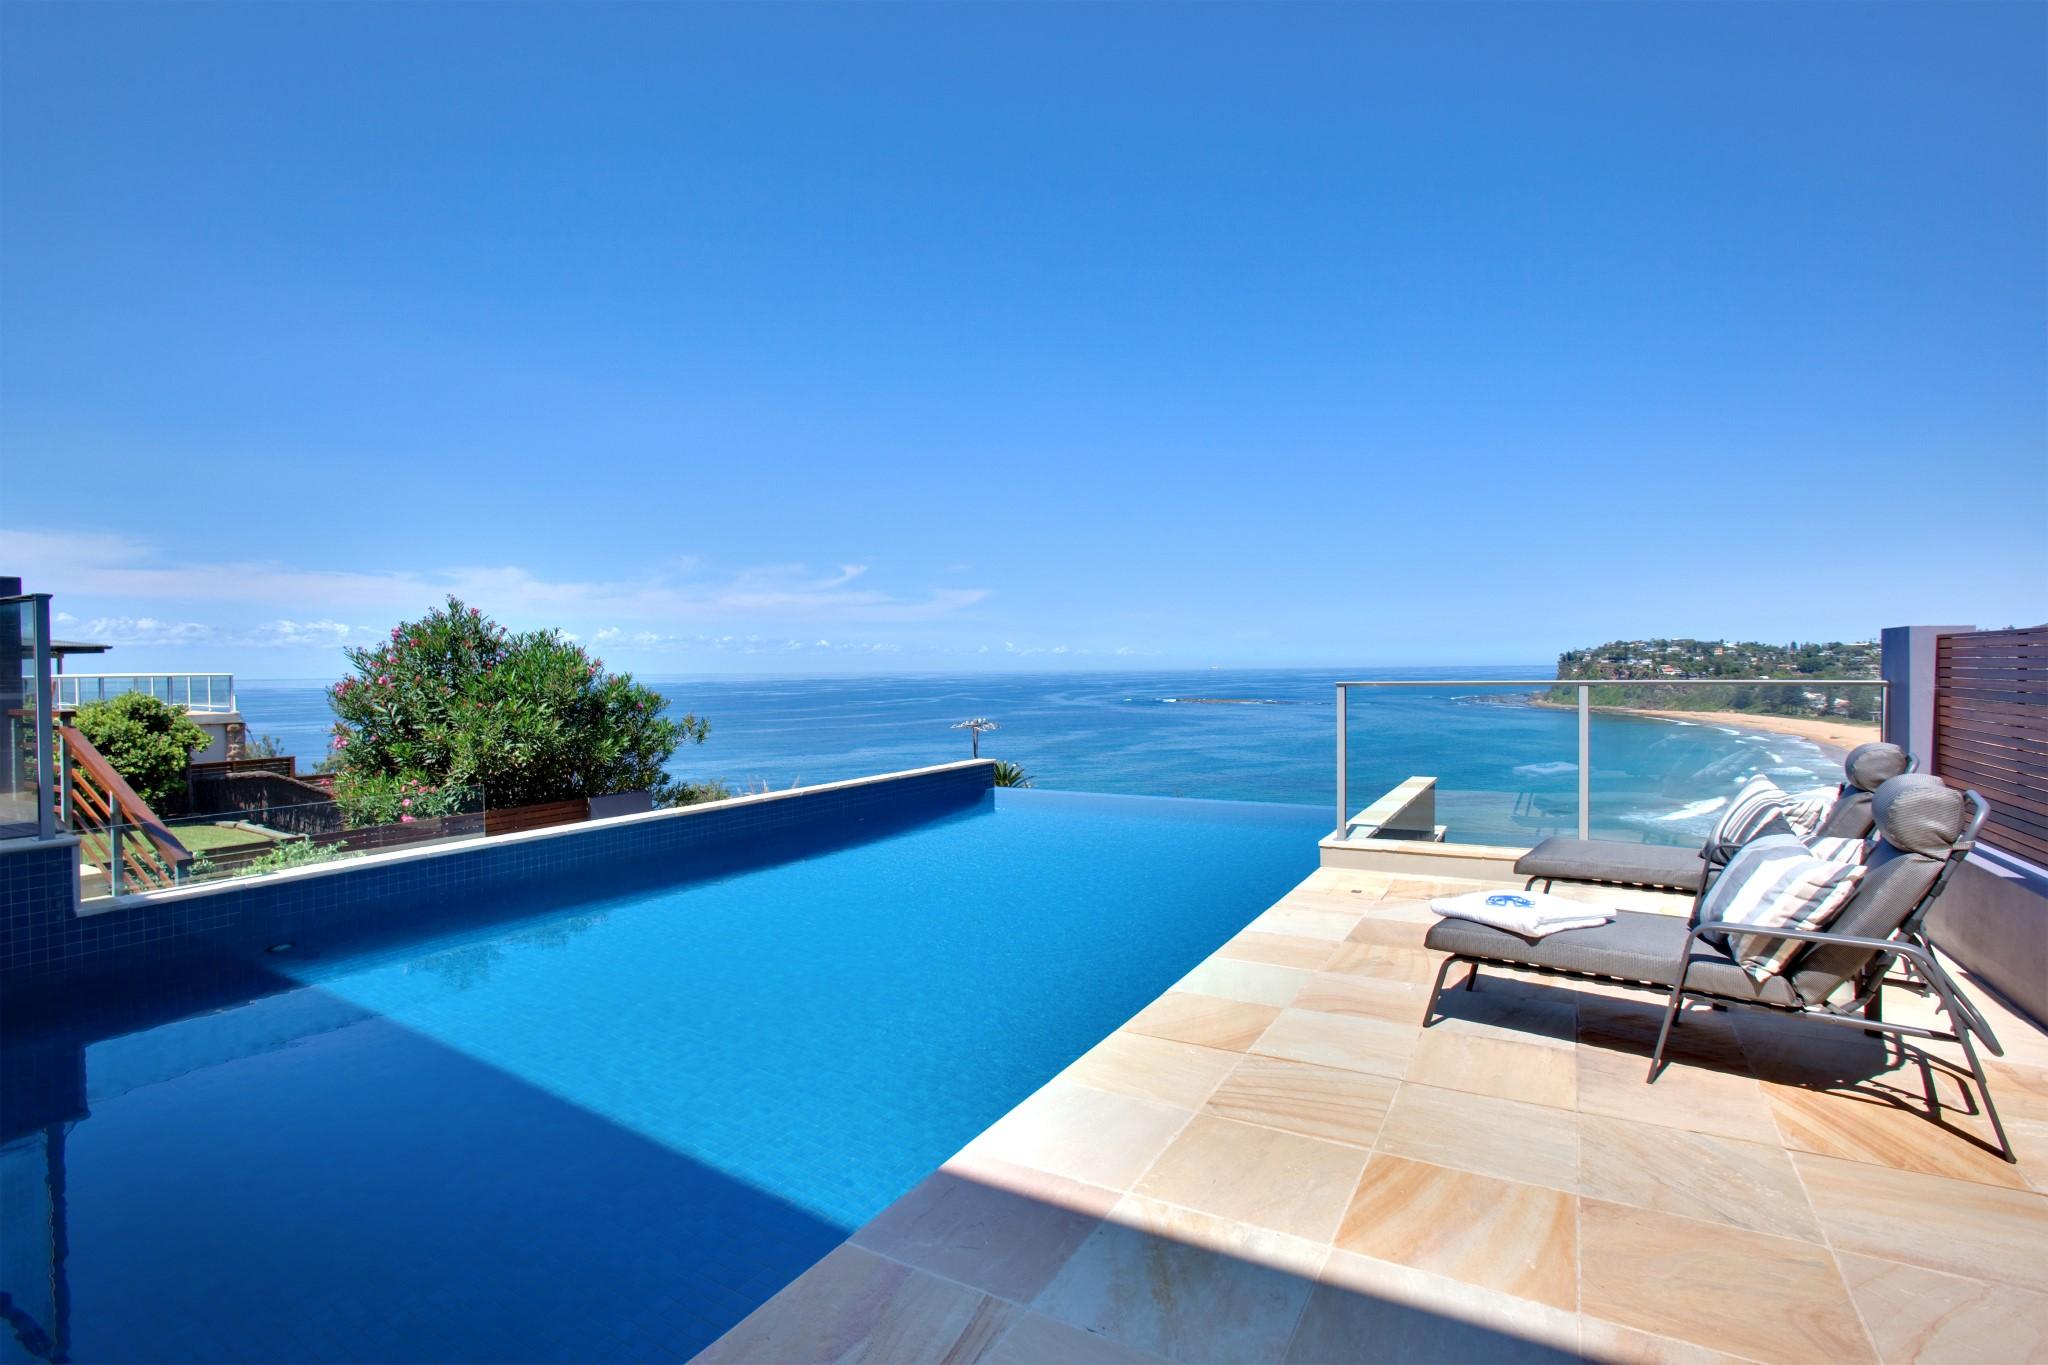 Breathtakingly beautiful beachfront pool in Newport